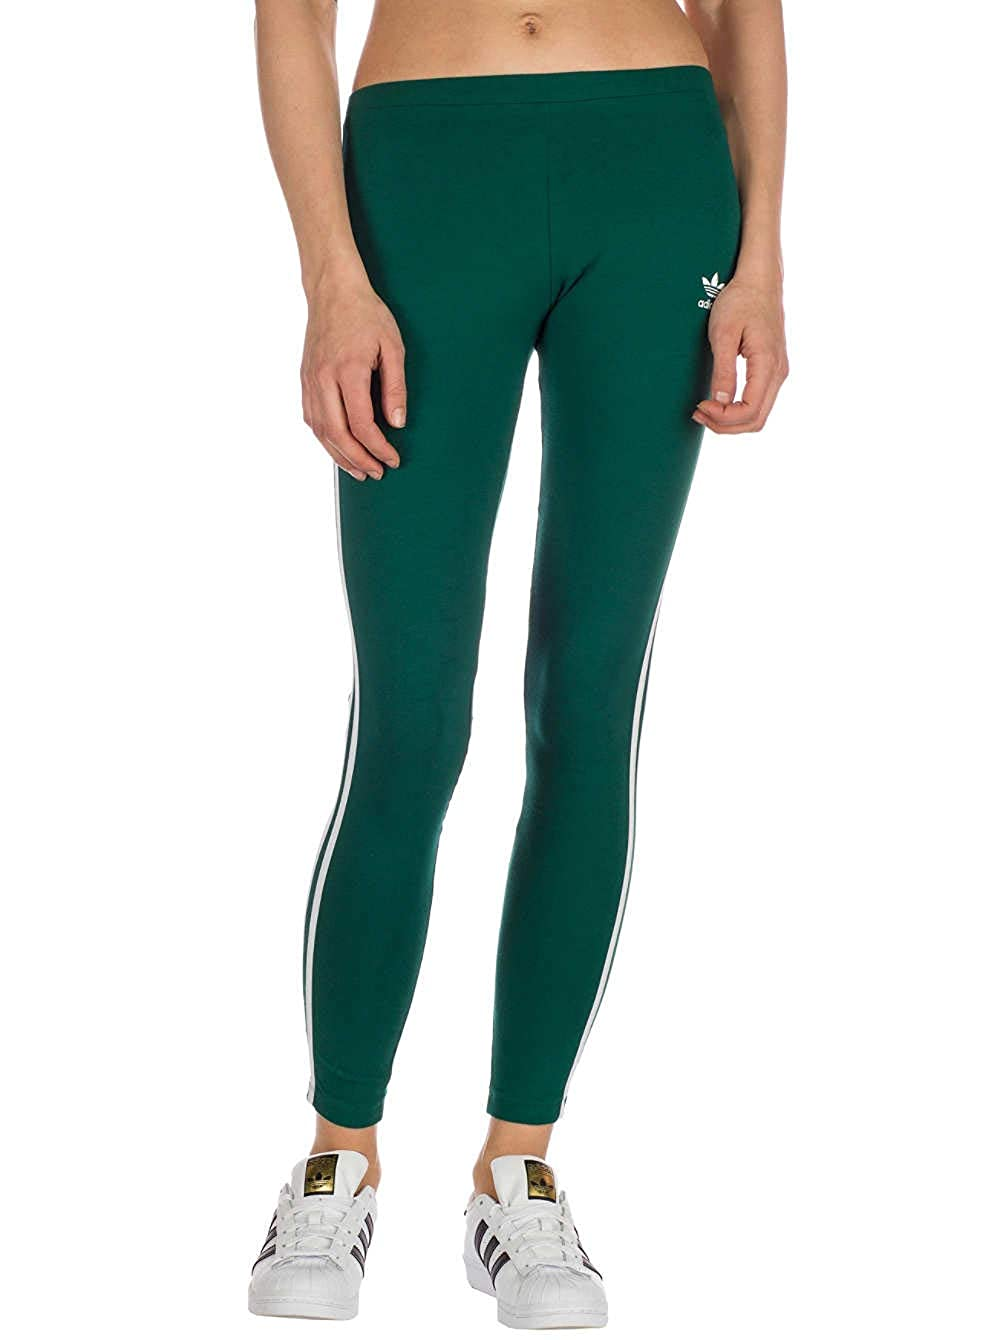 Adidas Originals 3 Str Tight Tights at Amazon Women's